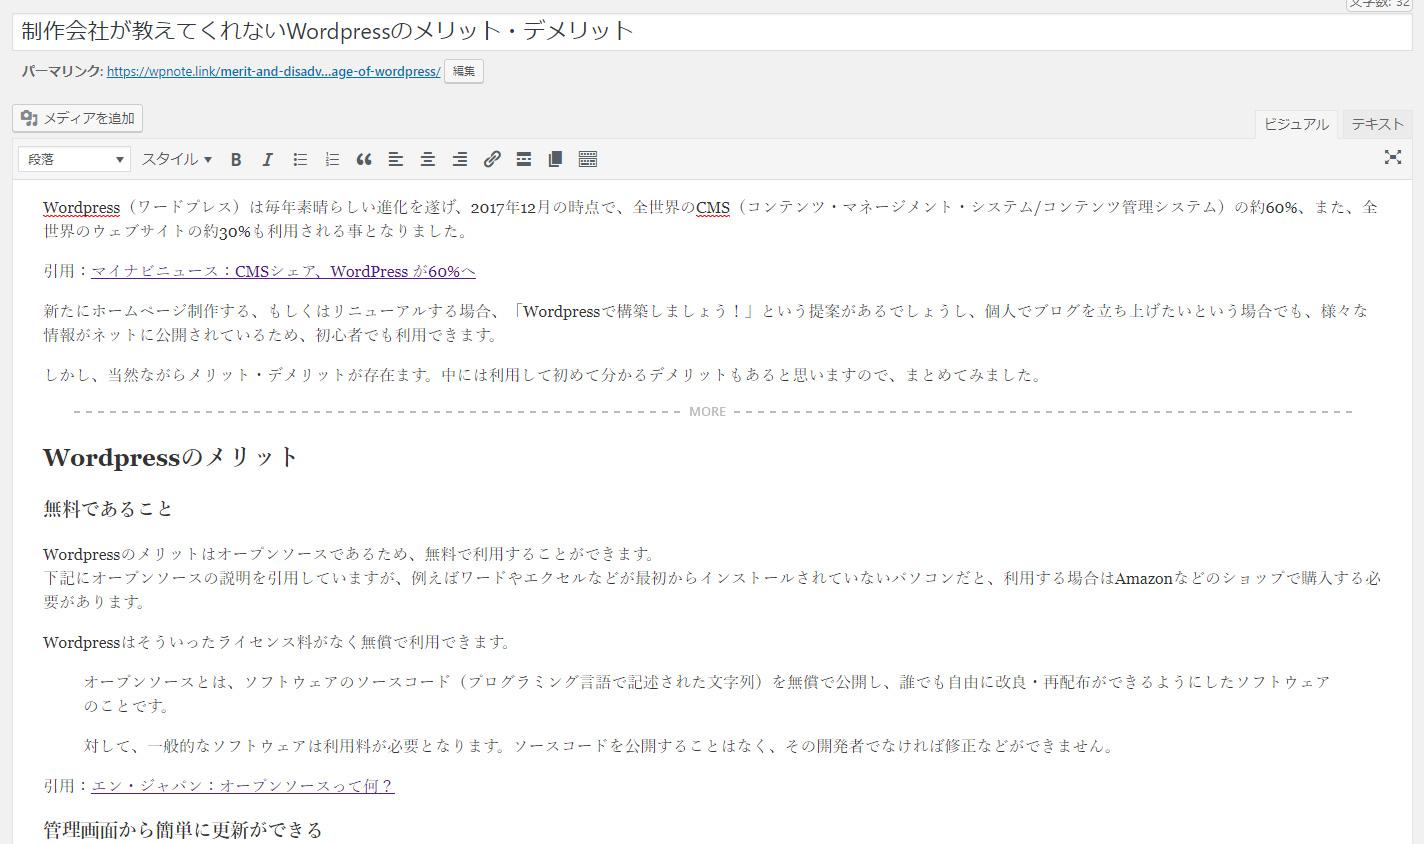 Wordpressは投稿画面から簡単に記事の作成・修正が行えます。